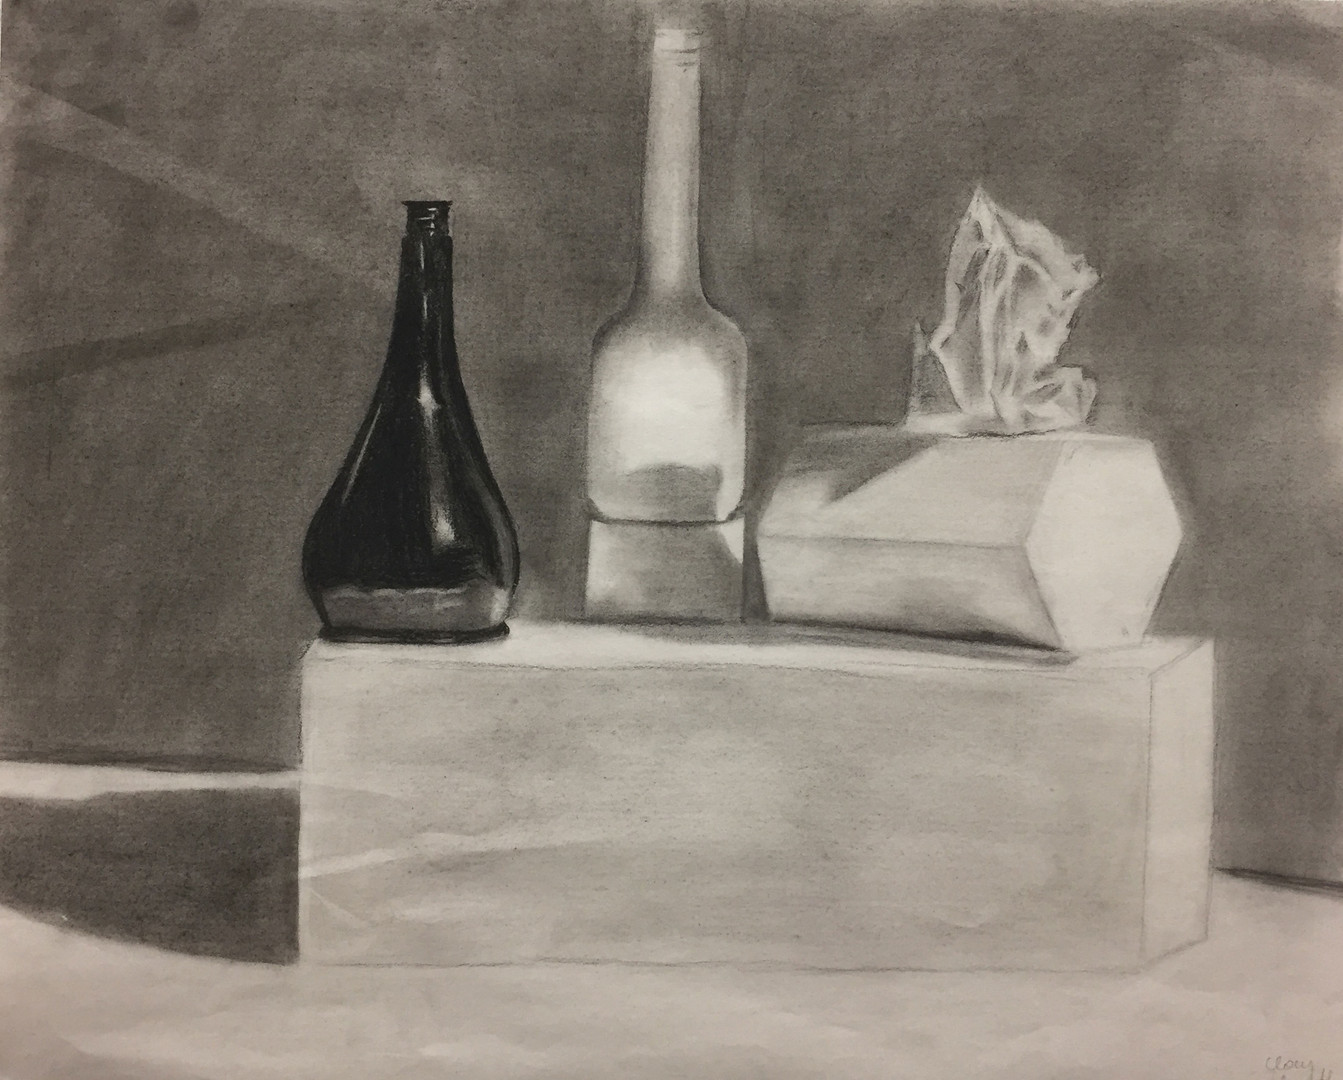 Cloey Ashworth Bottles